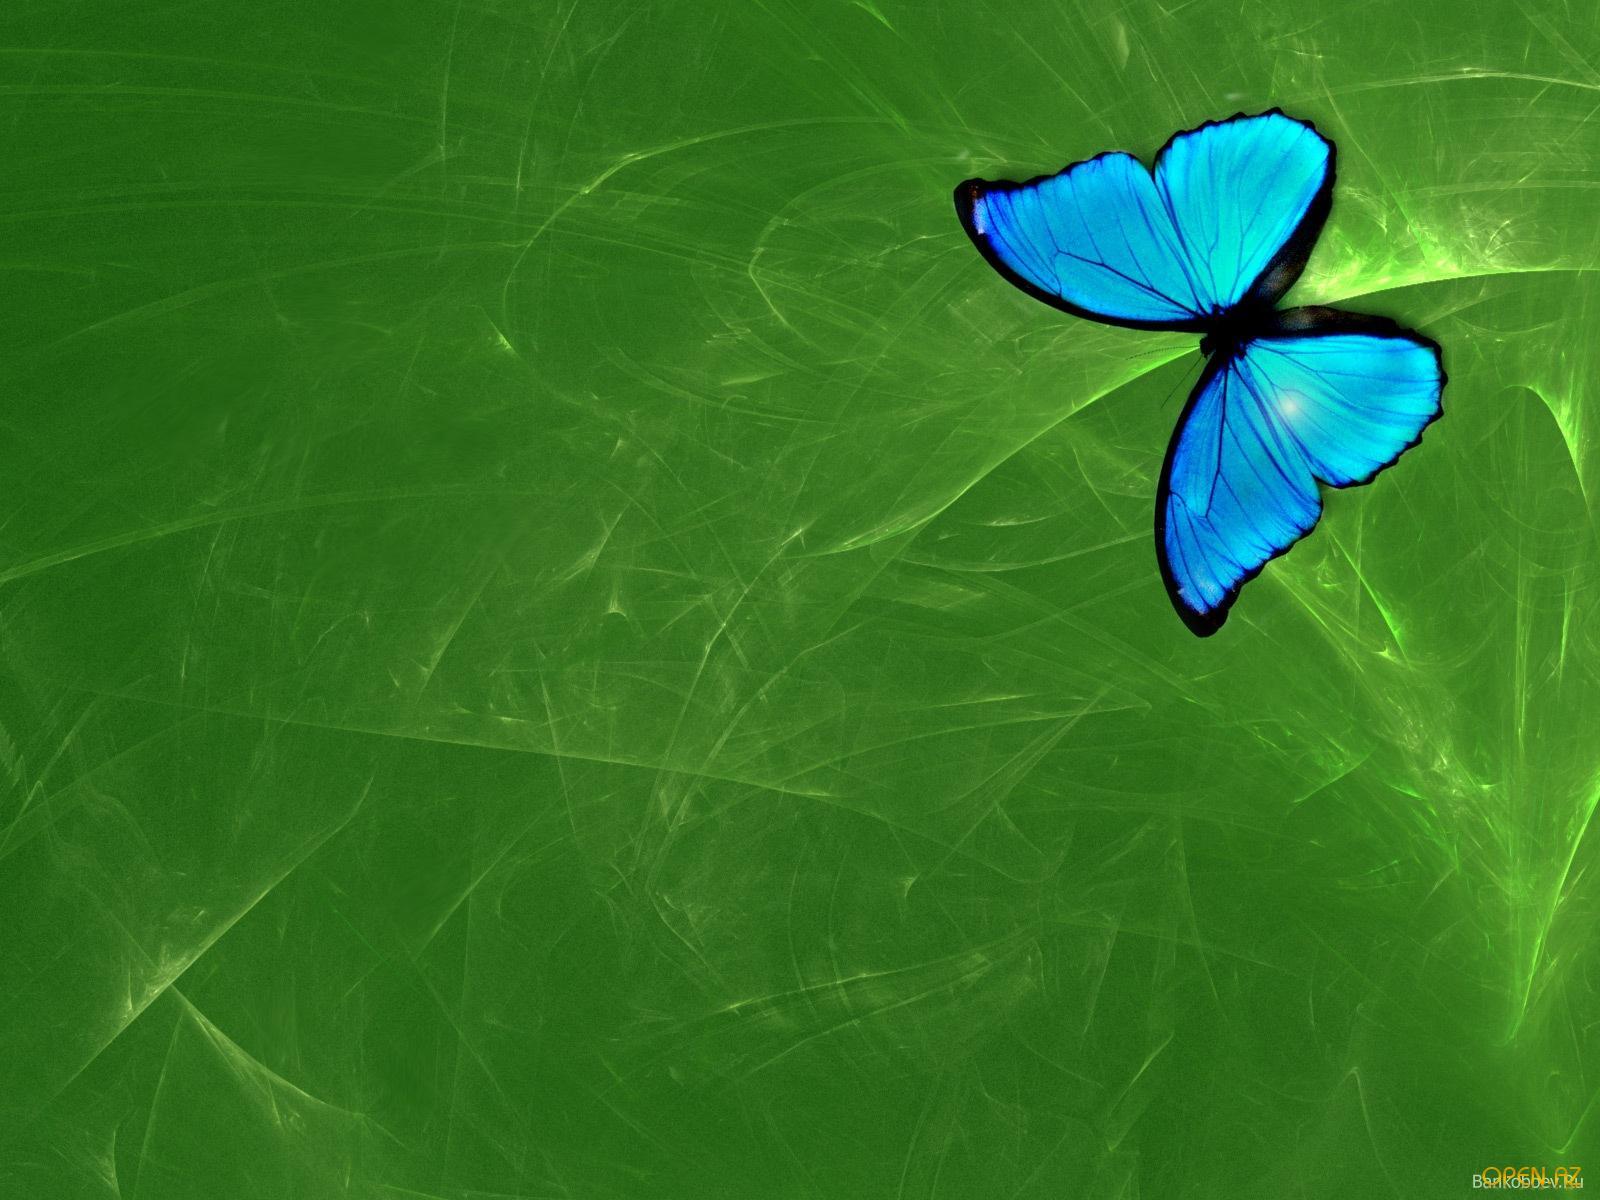 бабочка на зеленой траве  № 1396104 бесплатно